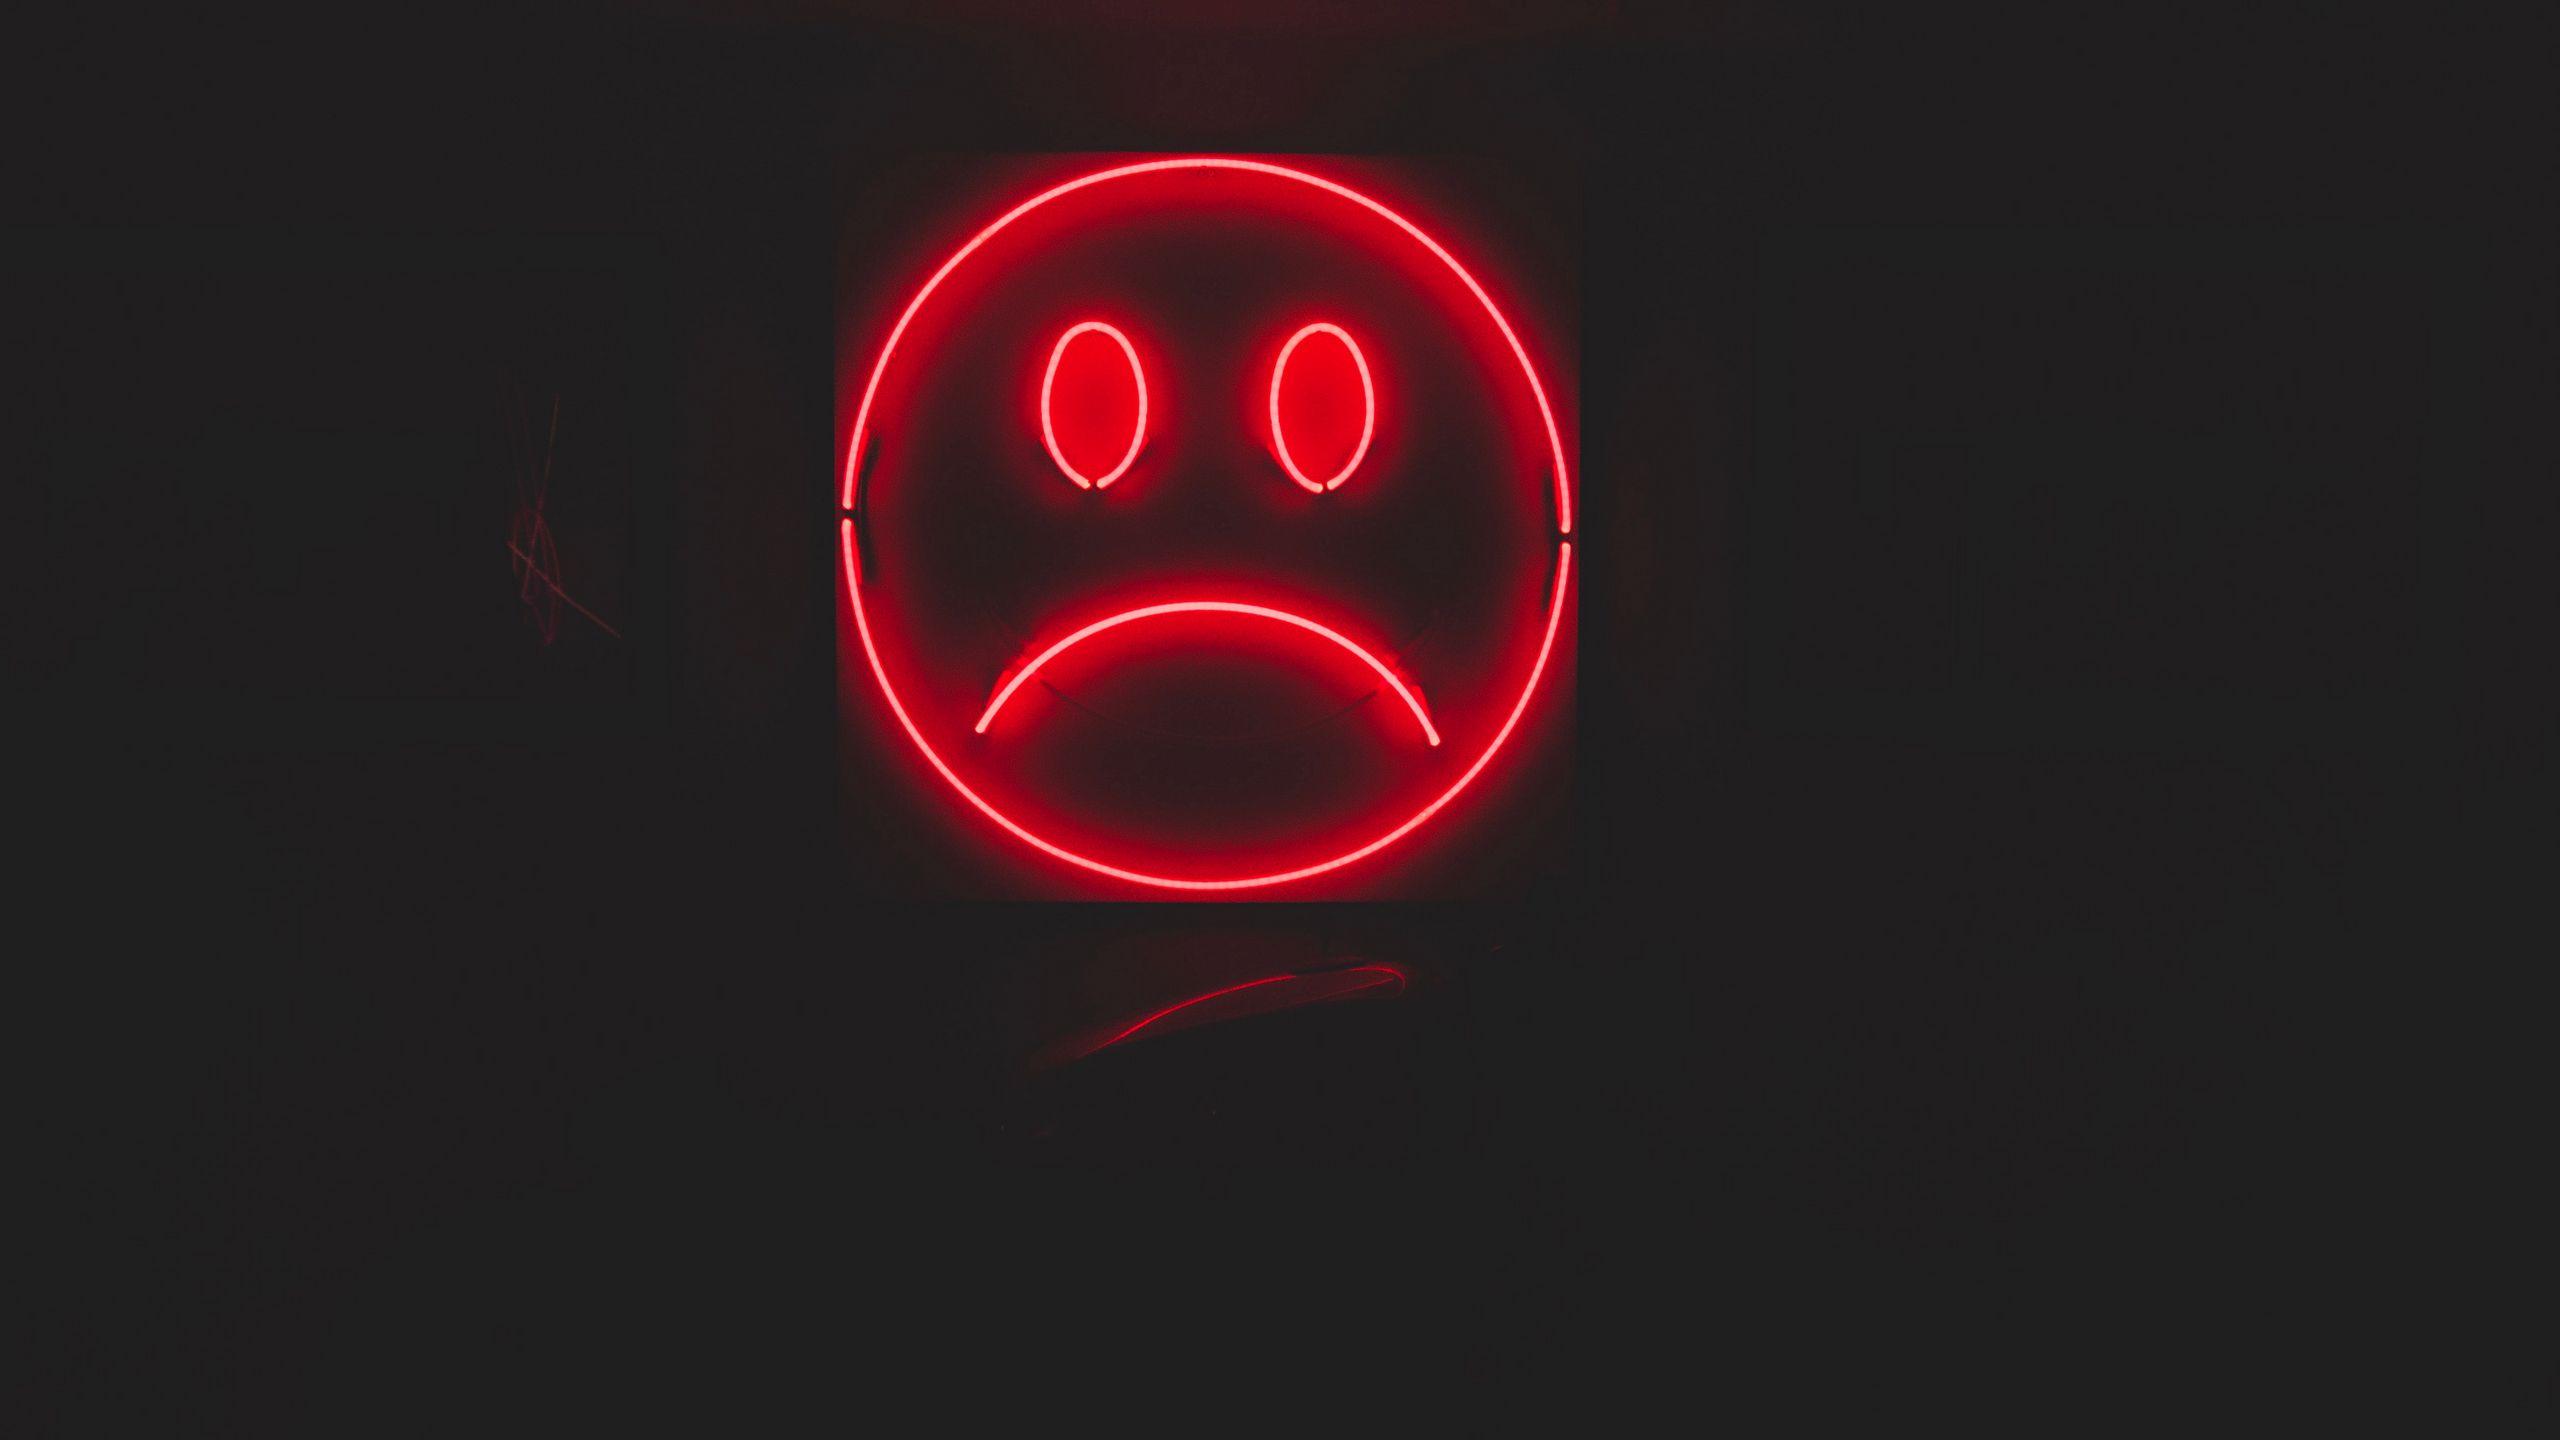 2560x1440 Wallpaper smile, smiley, sad, neon, red, dark